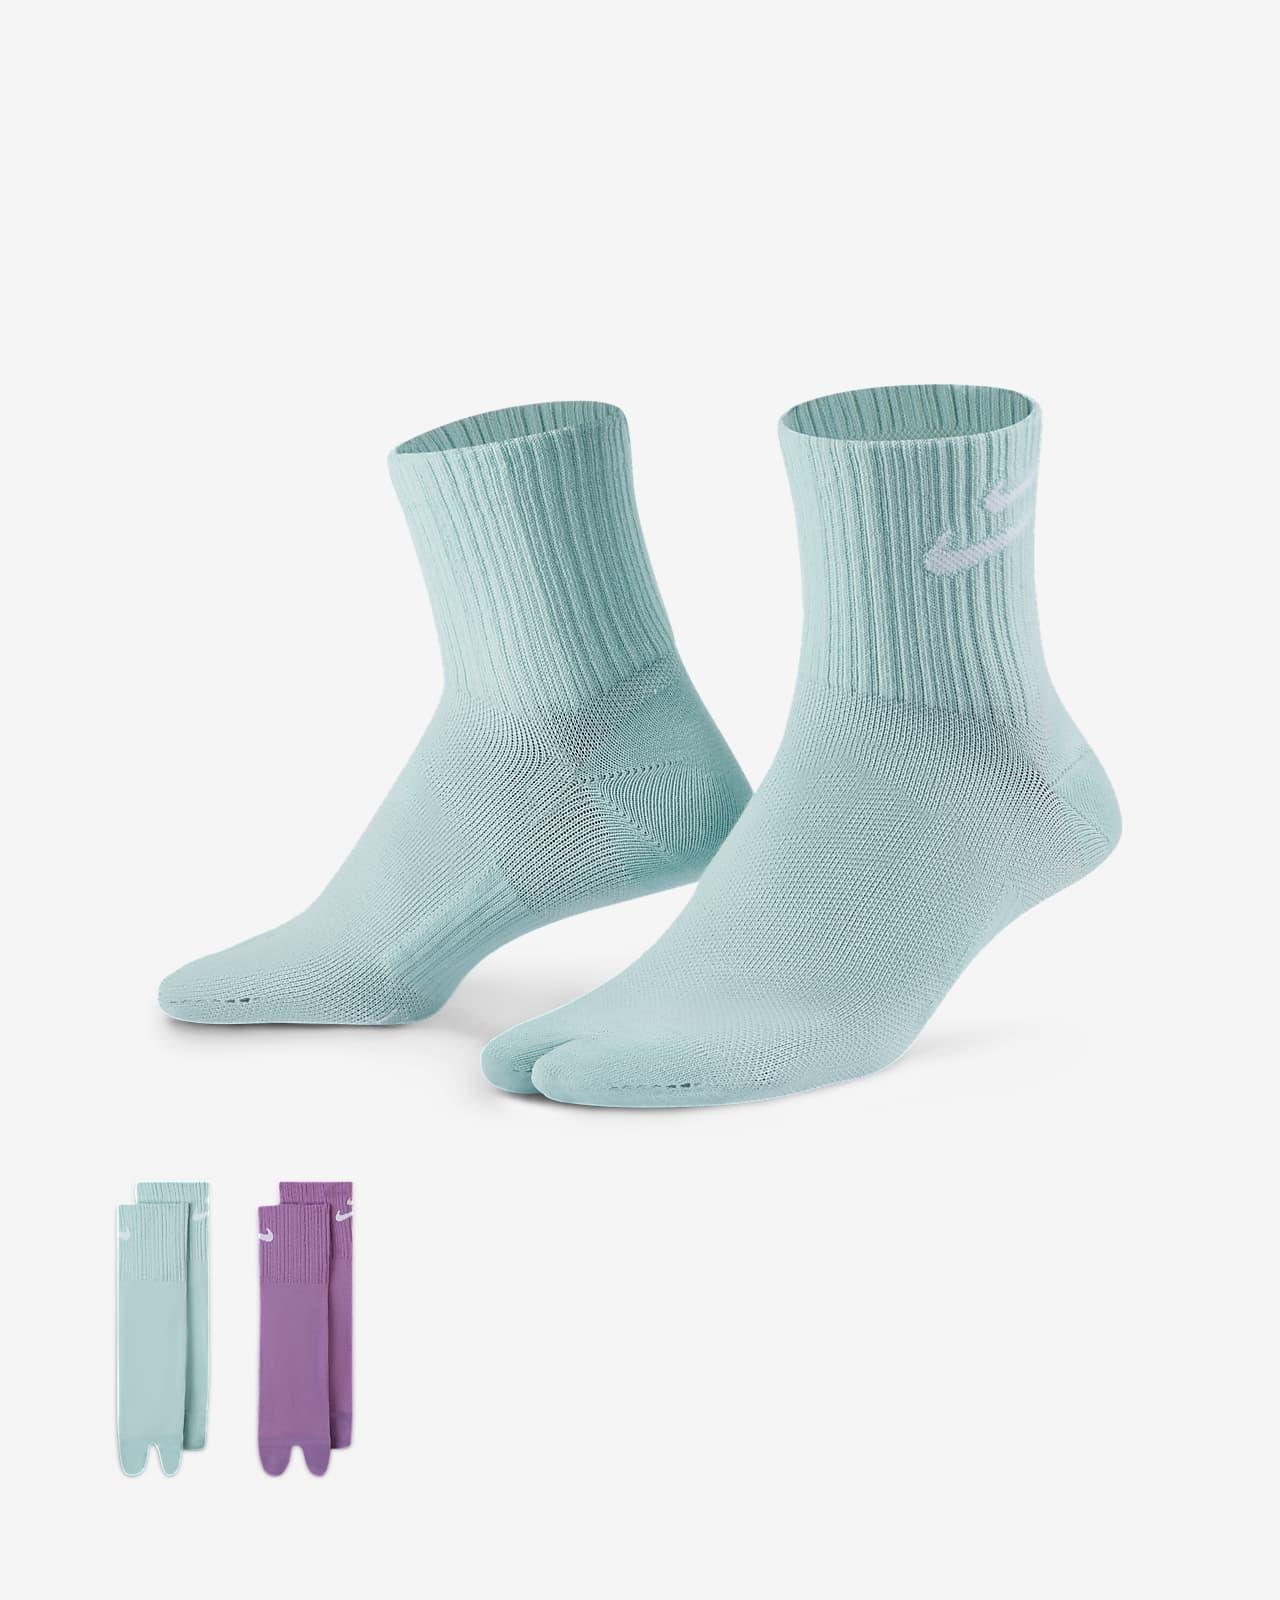 Nike 萬用過踝襪 (2 雙)